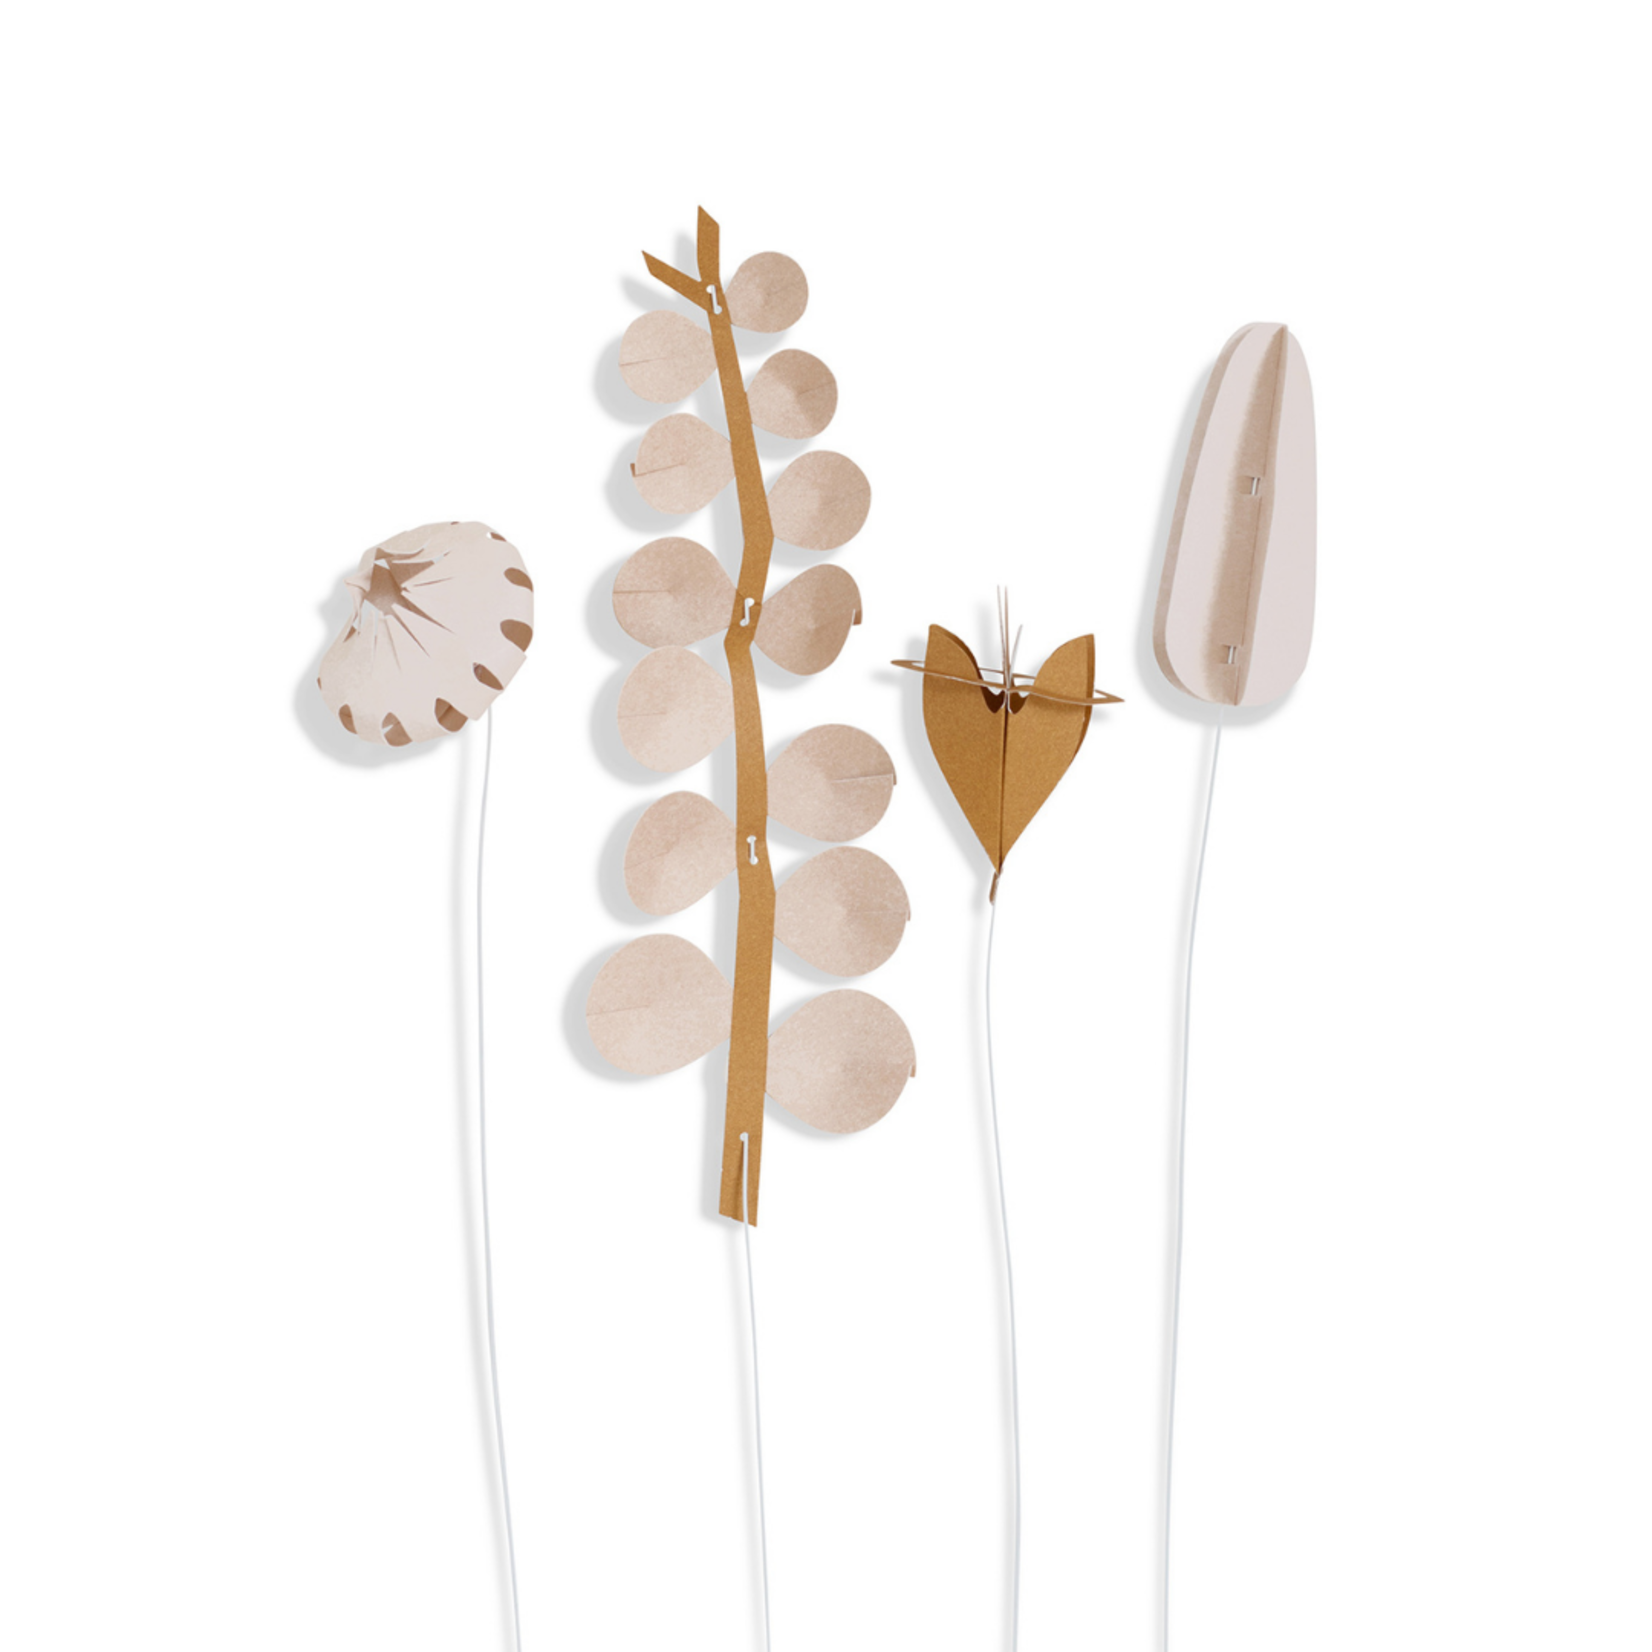 jurianne matter  jurianne matter - field - flowers -  small